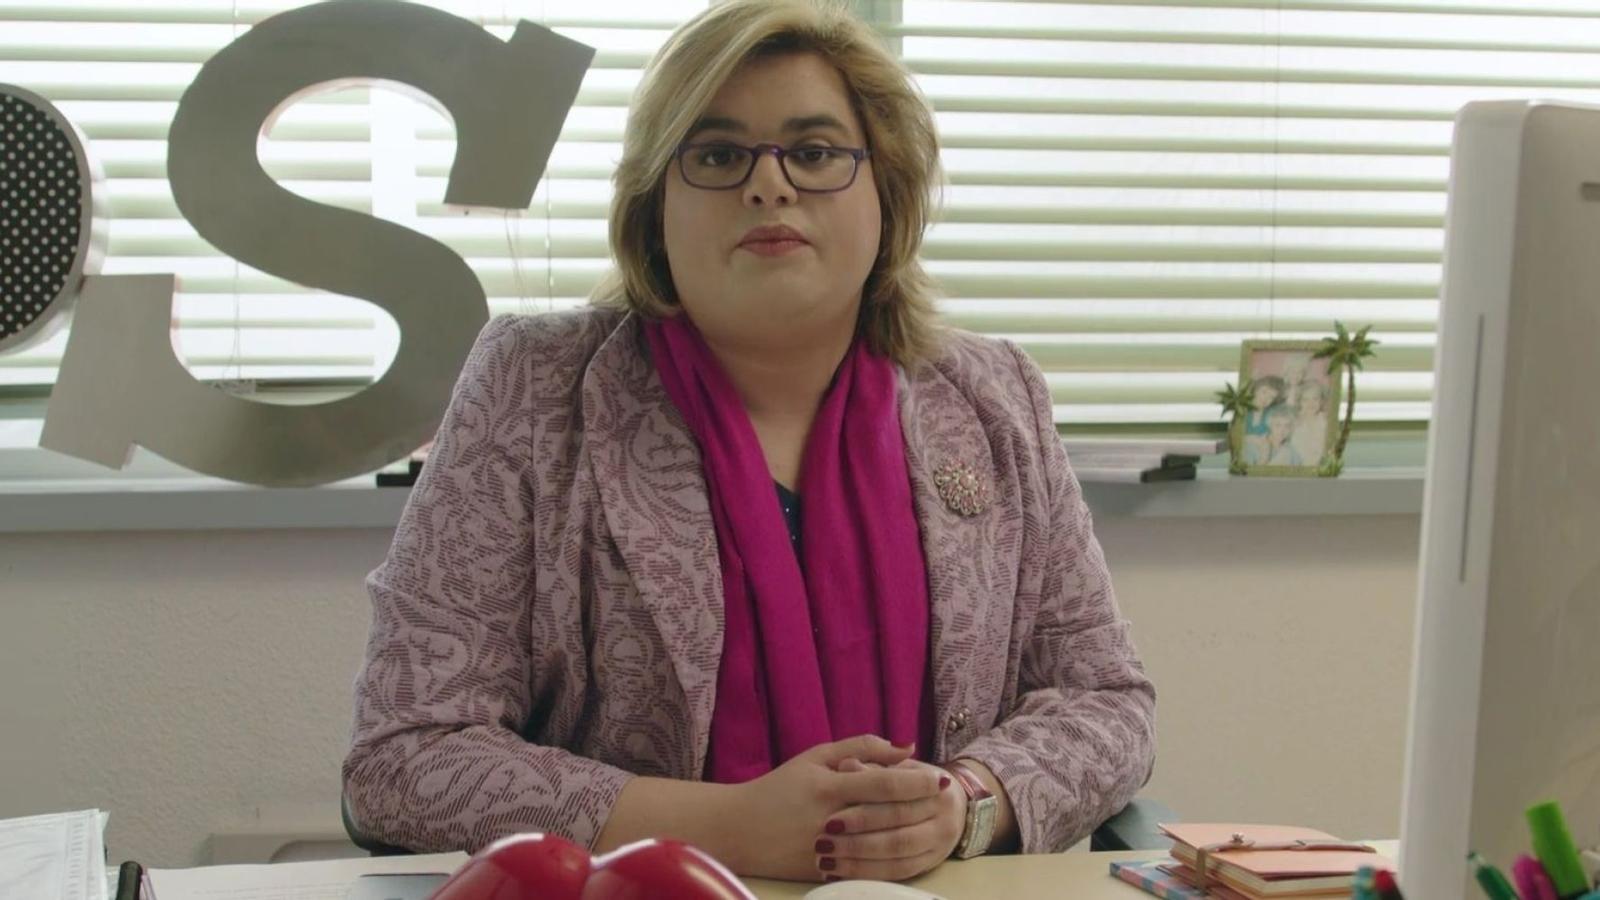 'Paquita Salas' estrena la segona temporada el 29 de juny